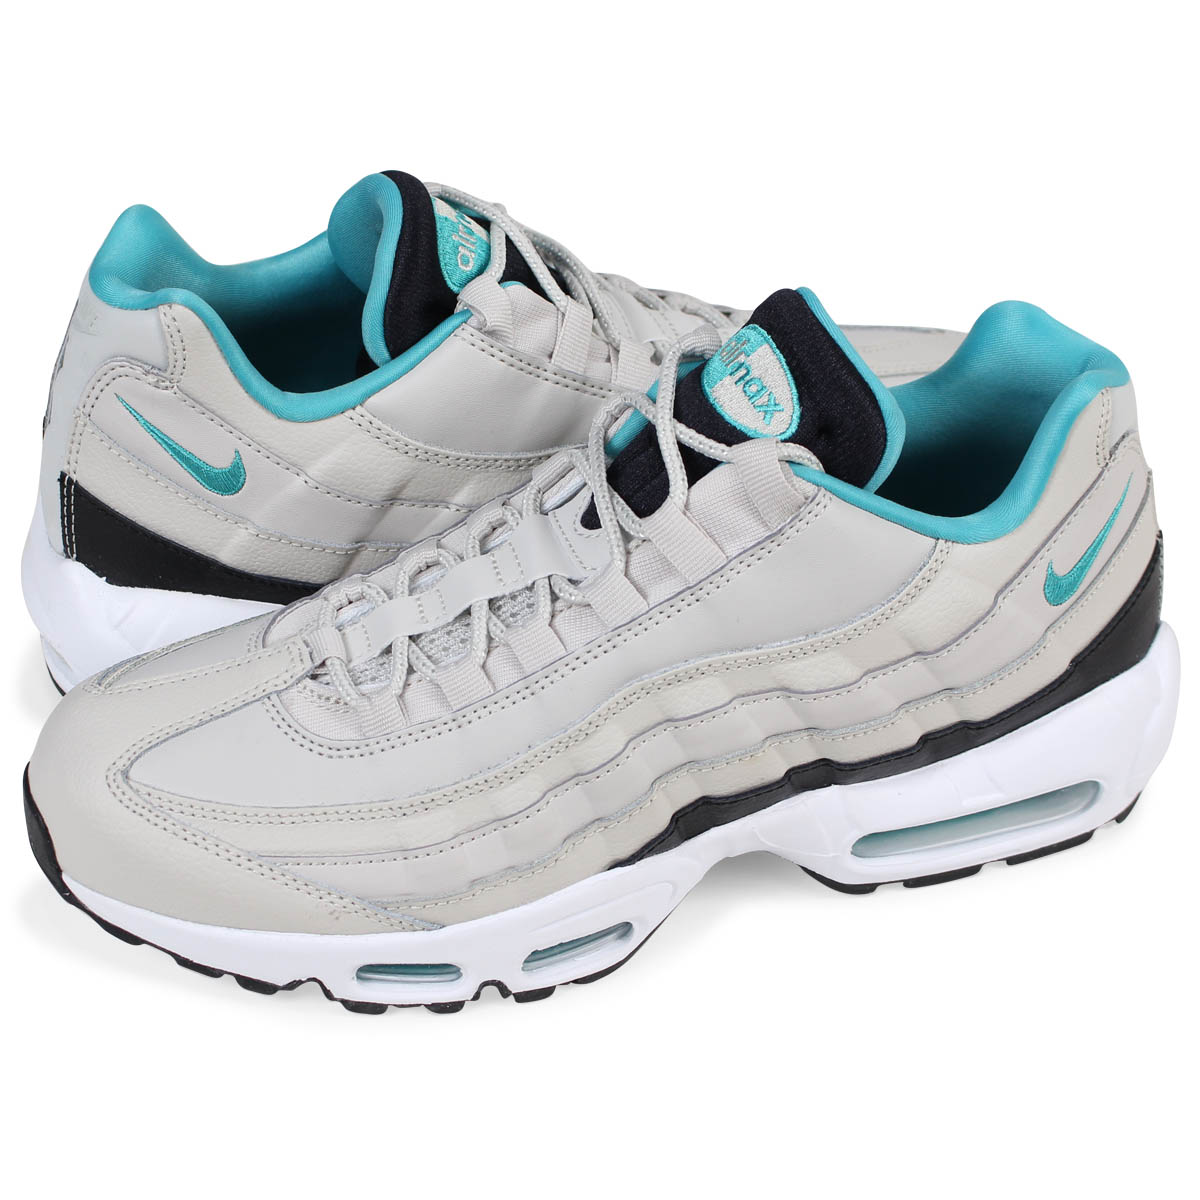 new concept 6edf3 f0ef9 Nike NIKE Air Max 95 essential sneakers men AIR MAX 95 ESSENTIAL  749,766-027 off-white white